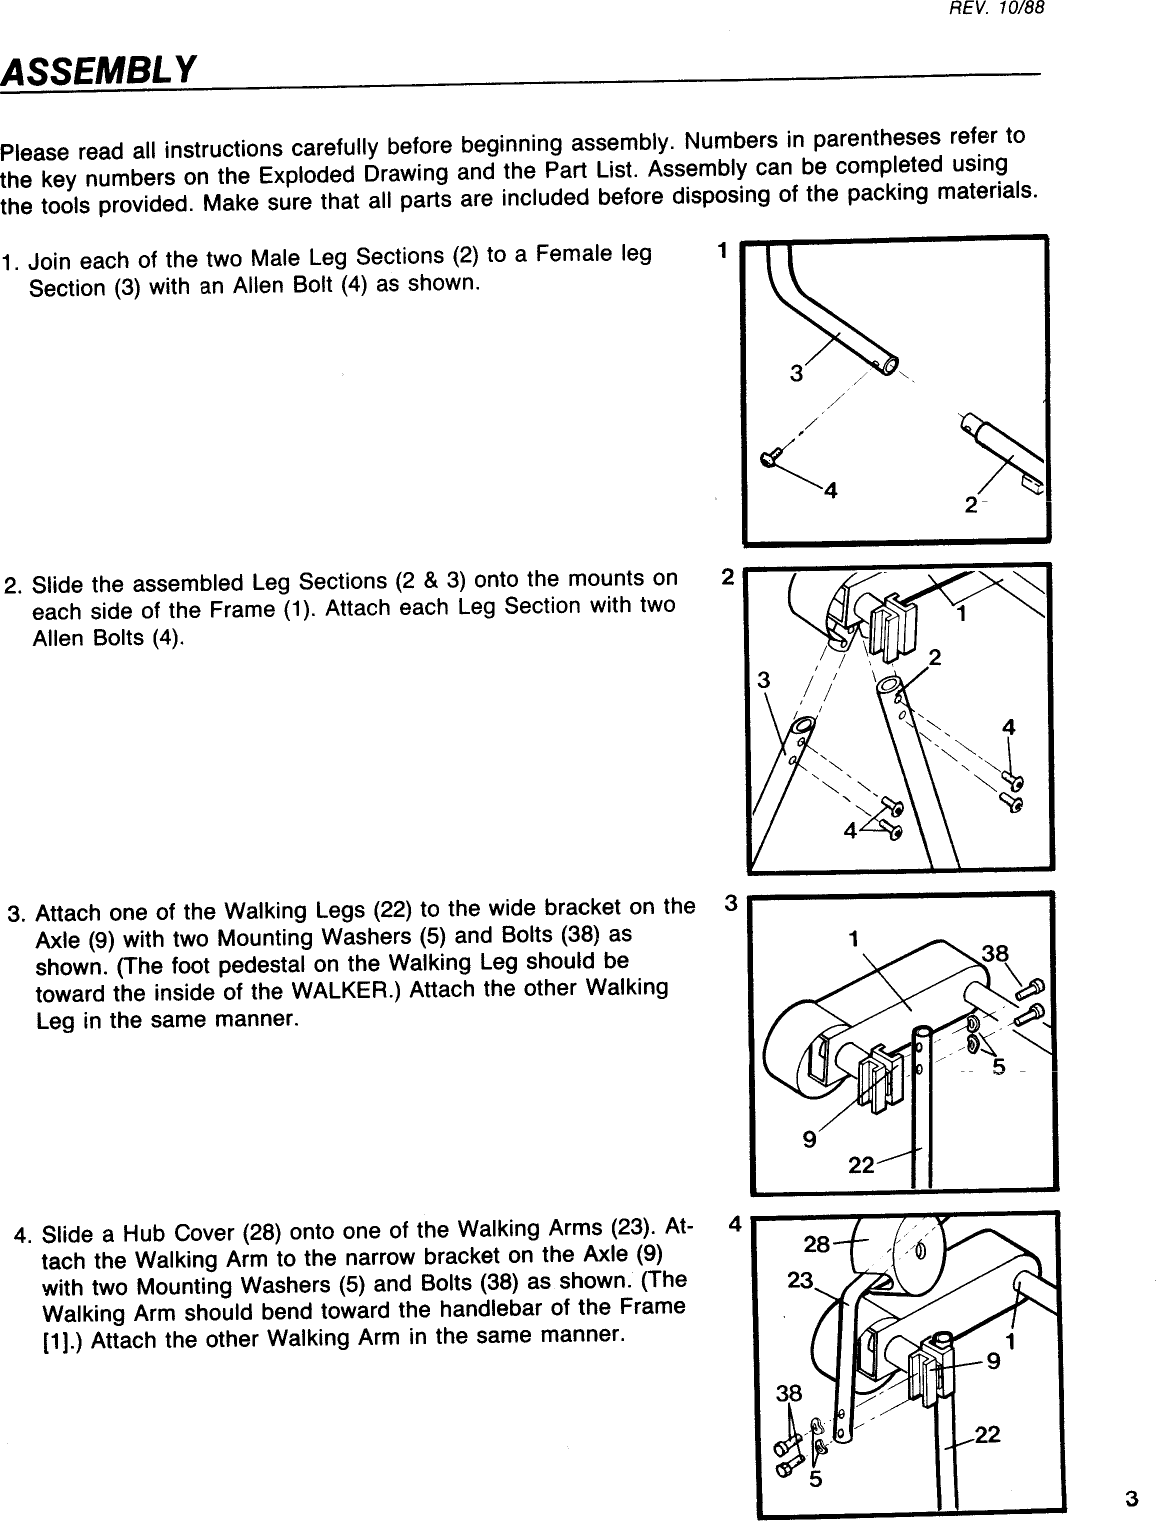 Proform Pfaw0 Air Walker Users Manual Tachometer Wiring Diagram Page 3 Of 8